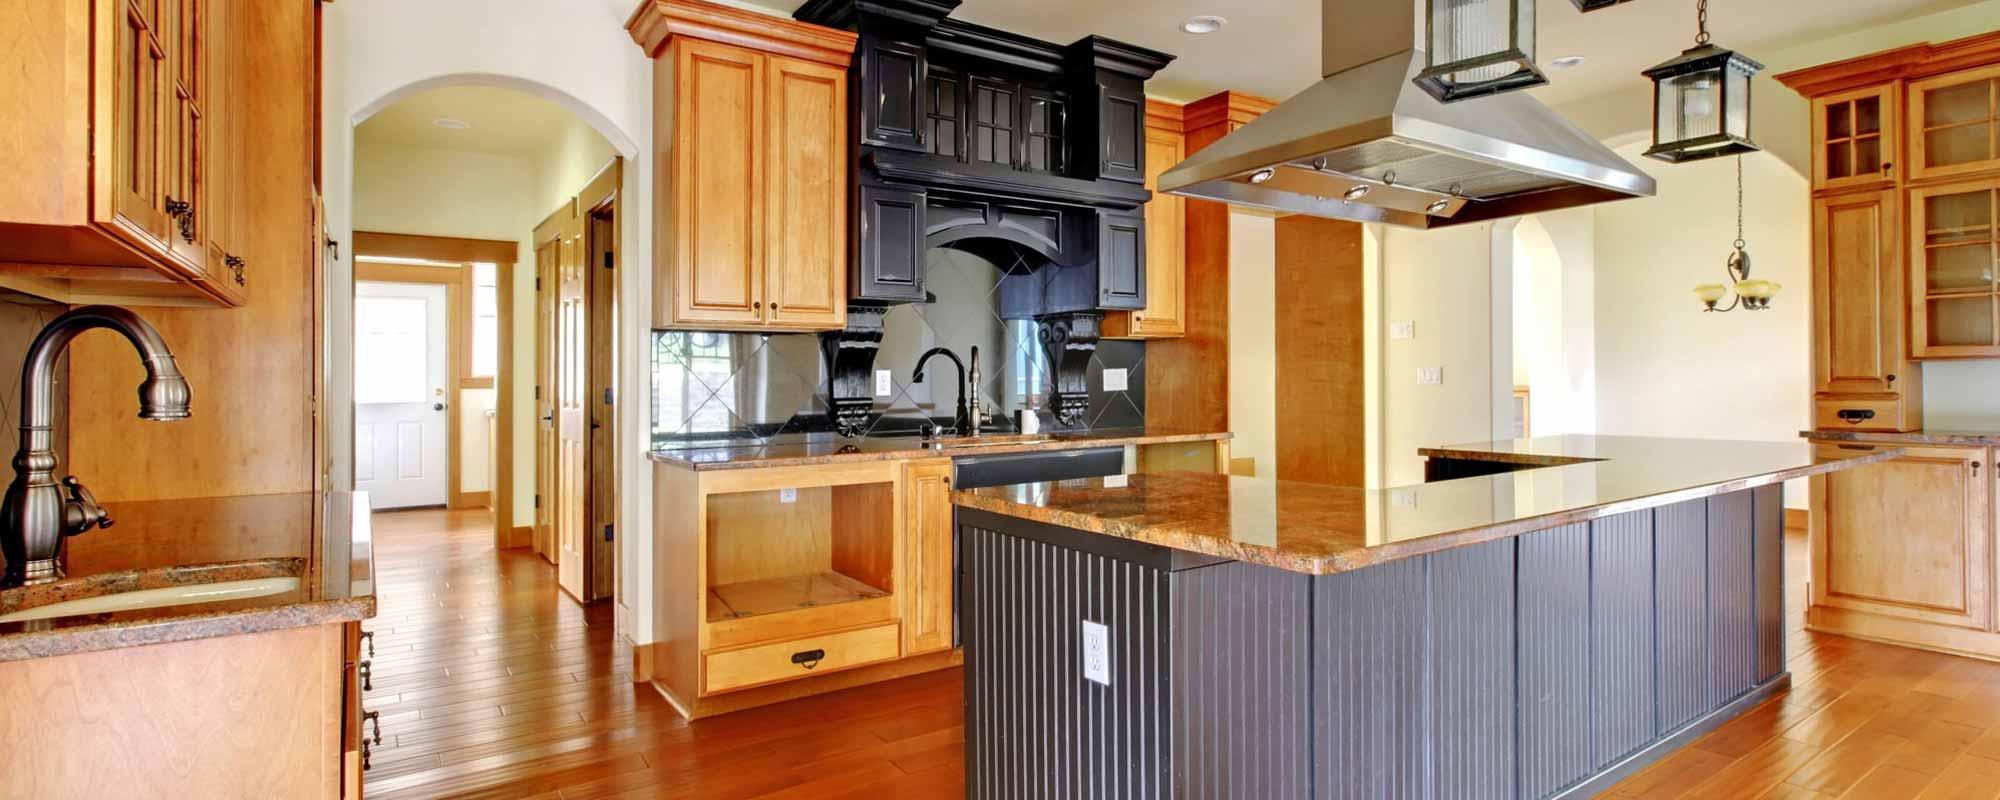 lyons5remodeling kitchen remodeling contractors Rockford Remodeling Company Rockford Kitchen